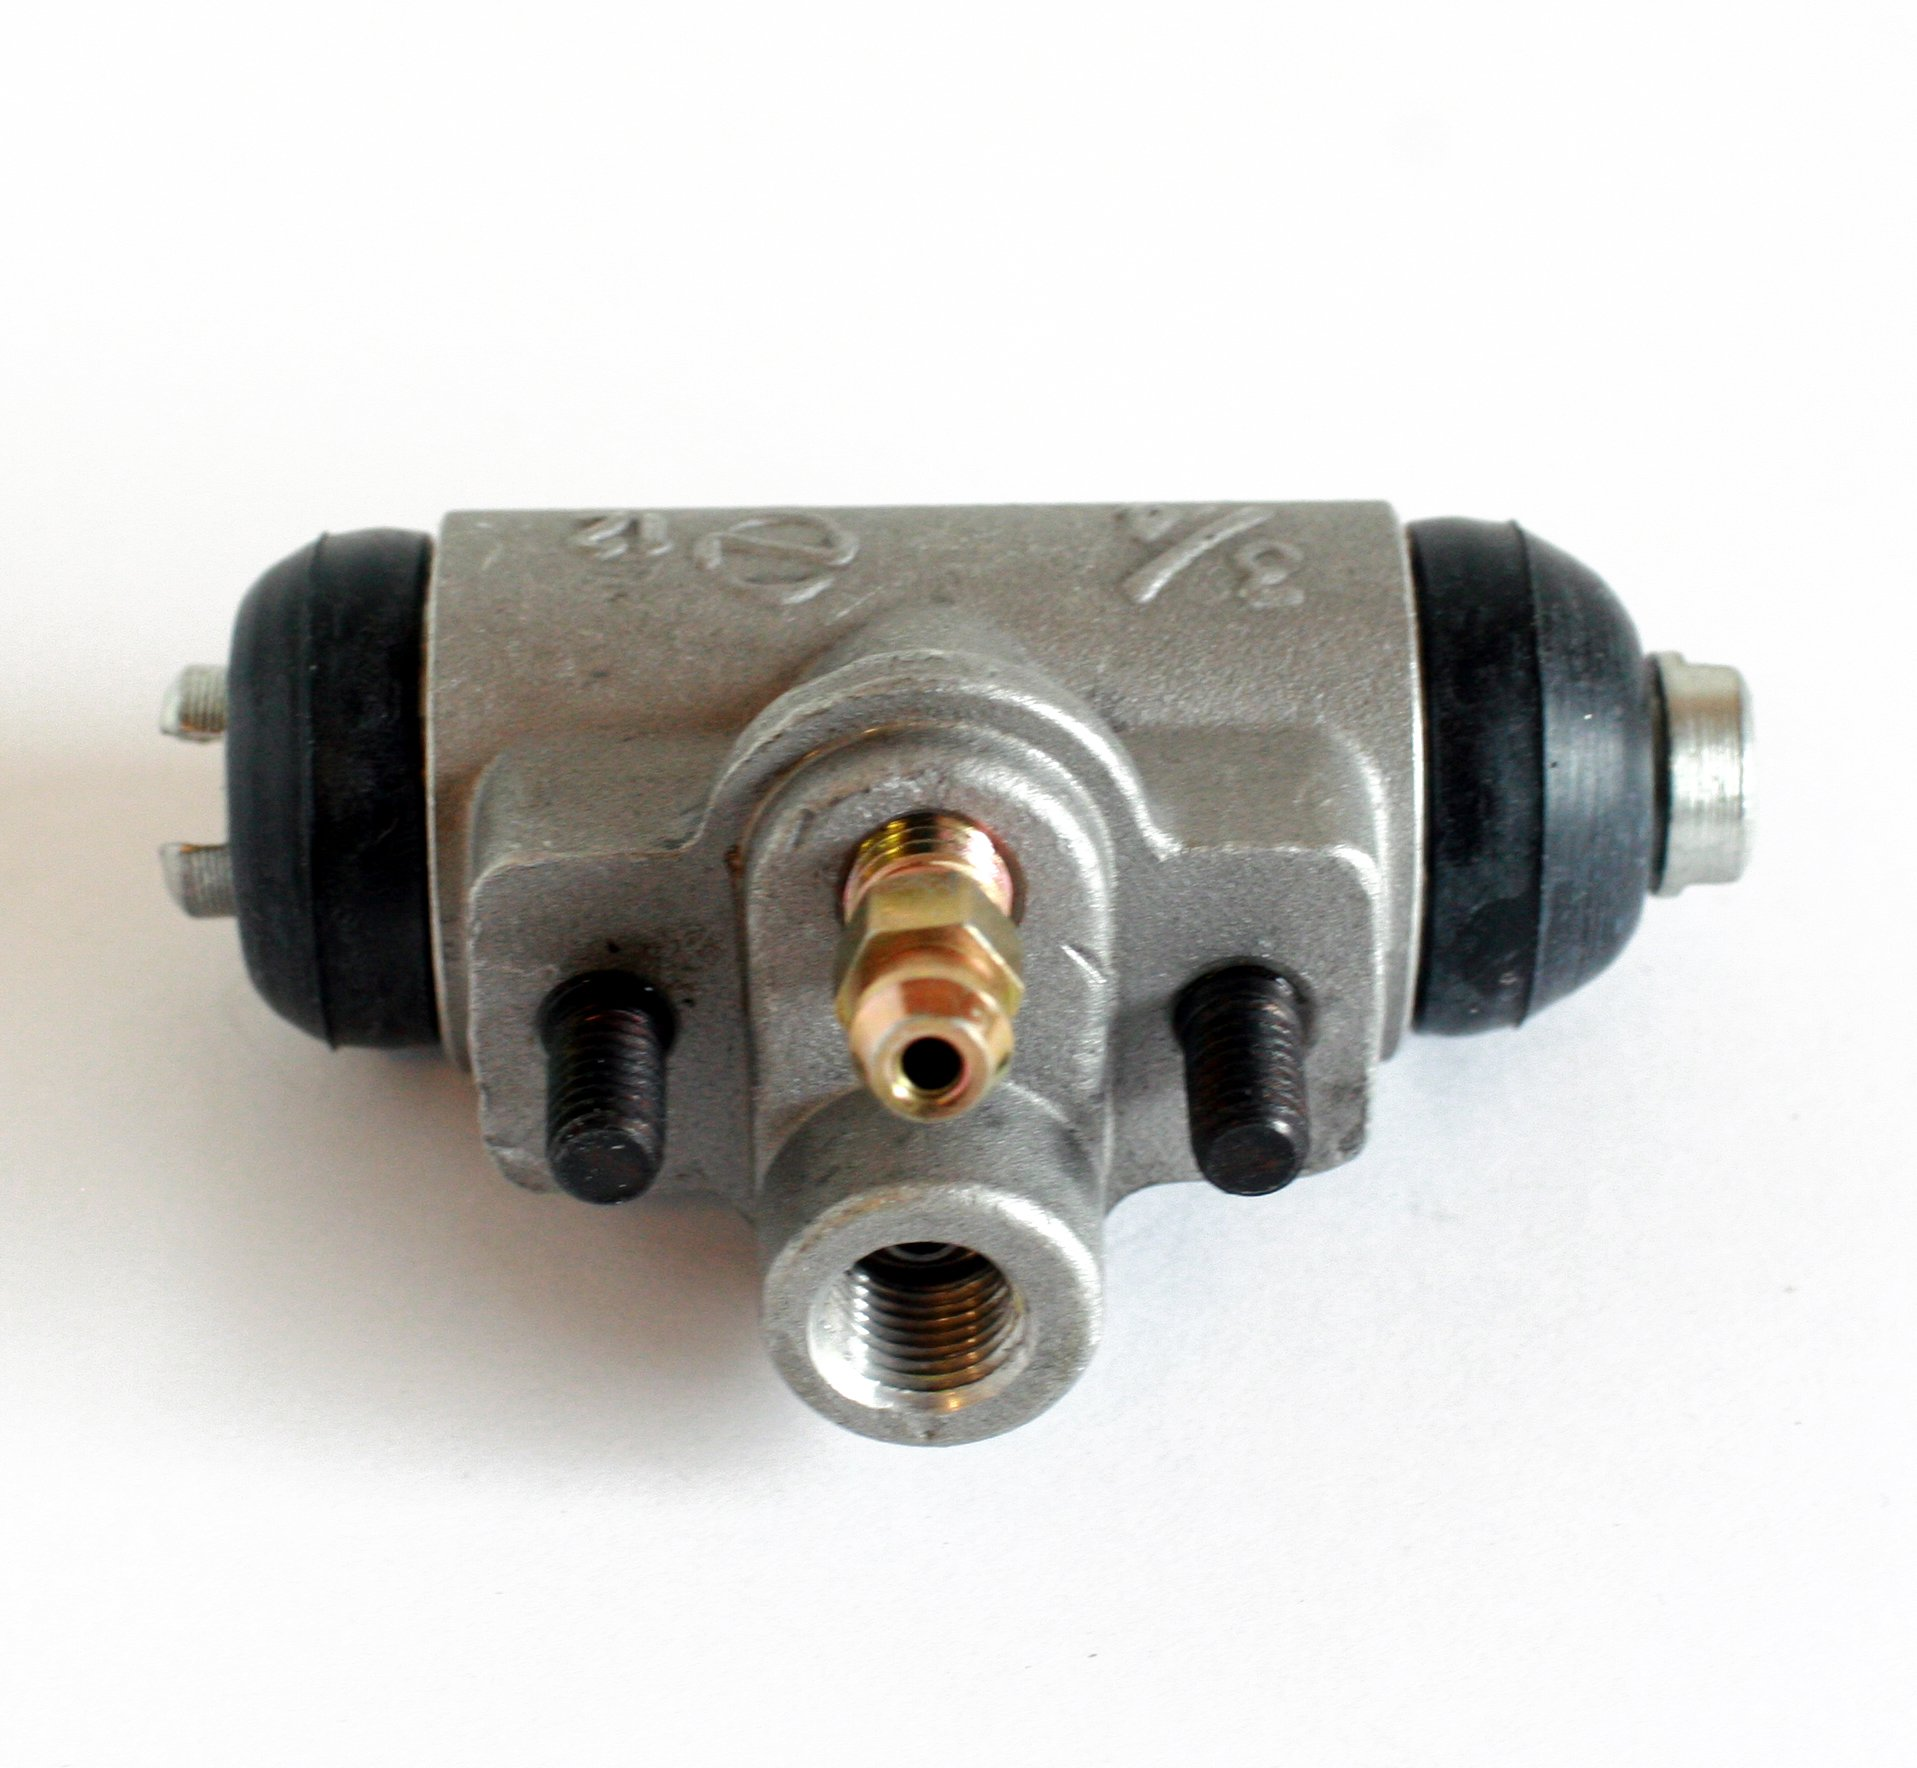 Kawasaki Mule NEW Rear Wheel/Brake Cylinder (Replaces OEM 43092-1053) by ATVWorks